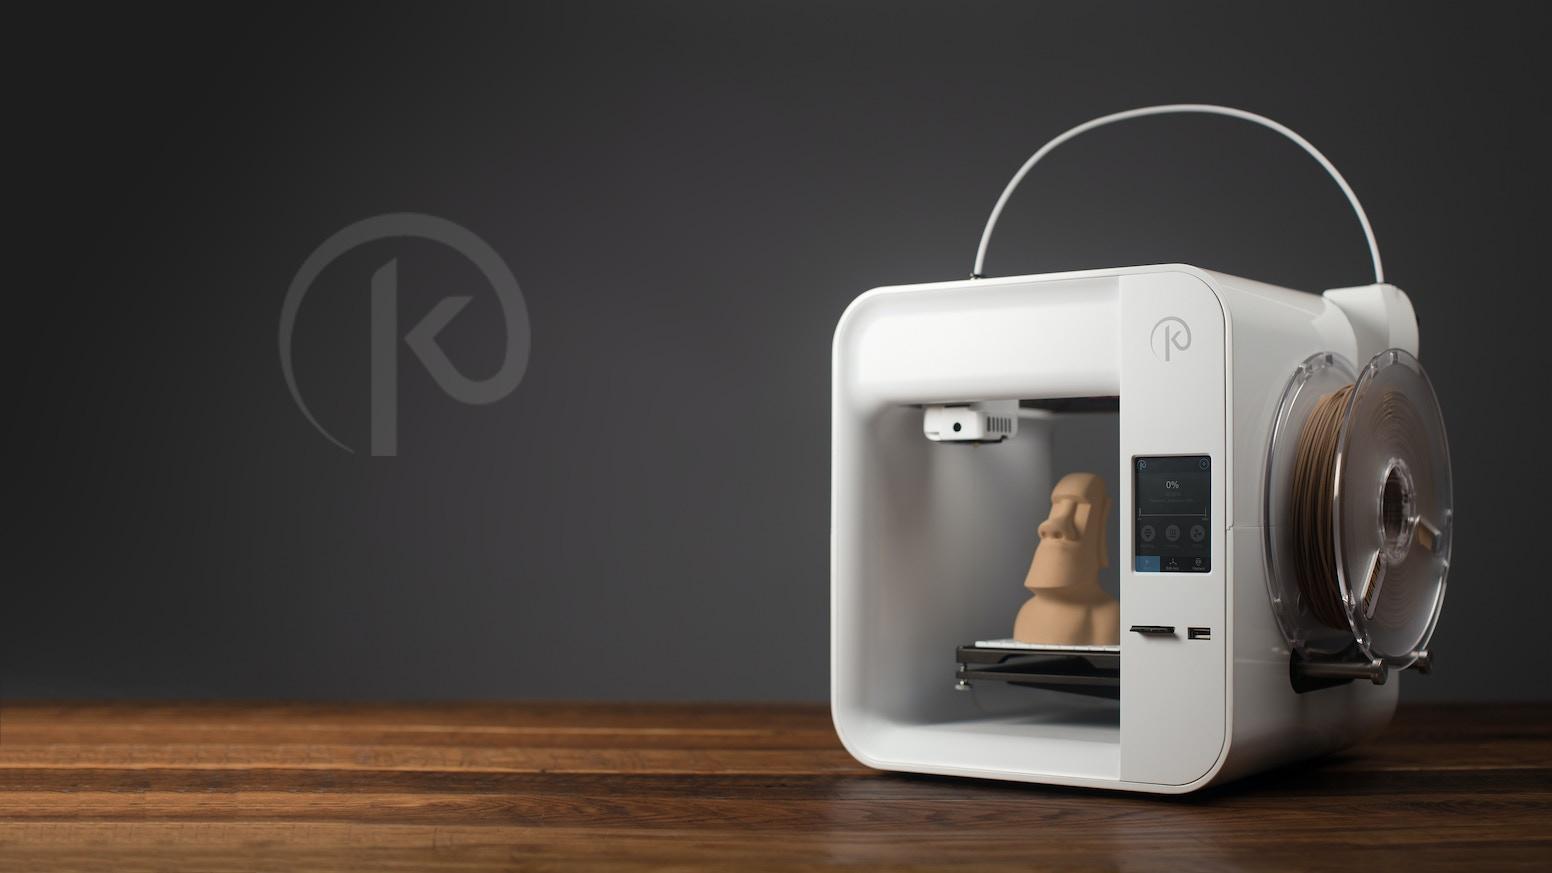 Obsidian 3D Printer: High Quality, Sleek, and Affordable  by Kodama